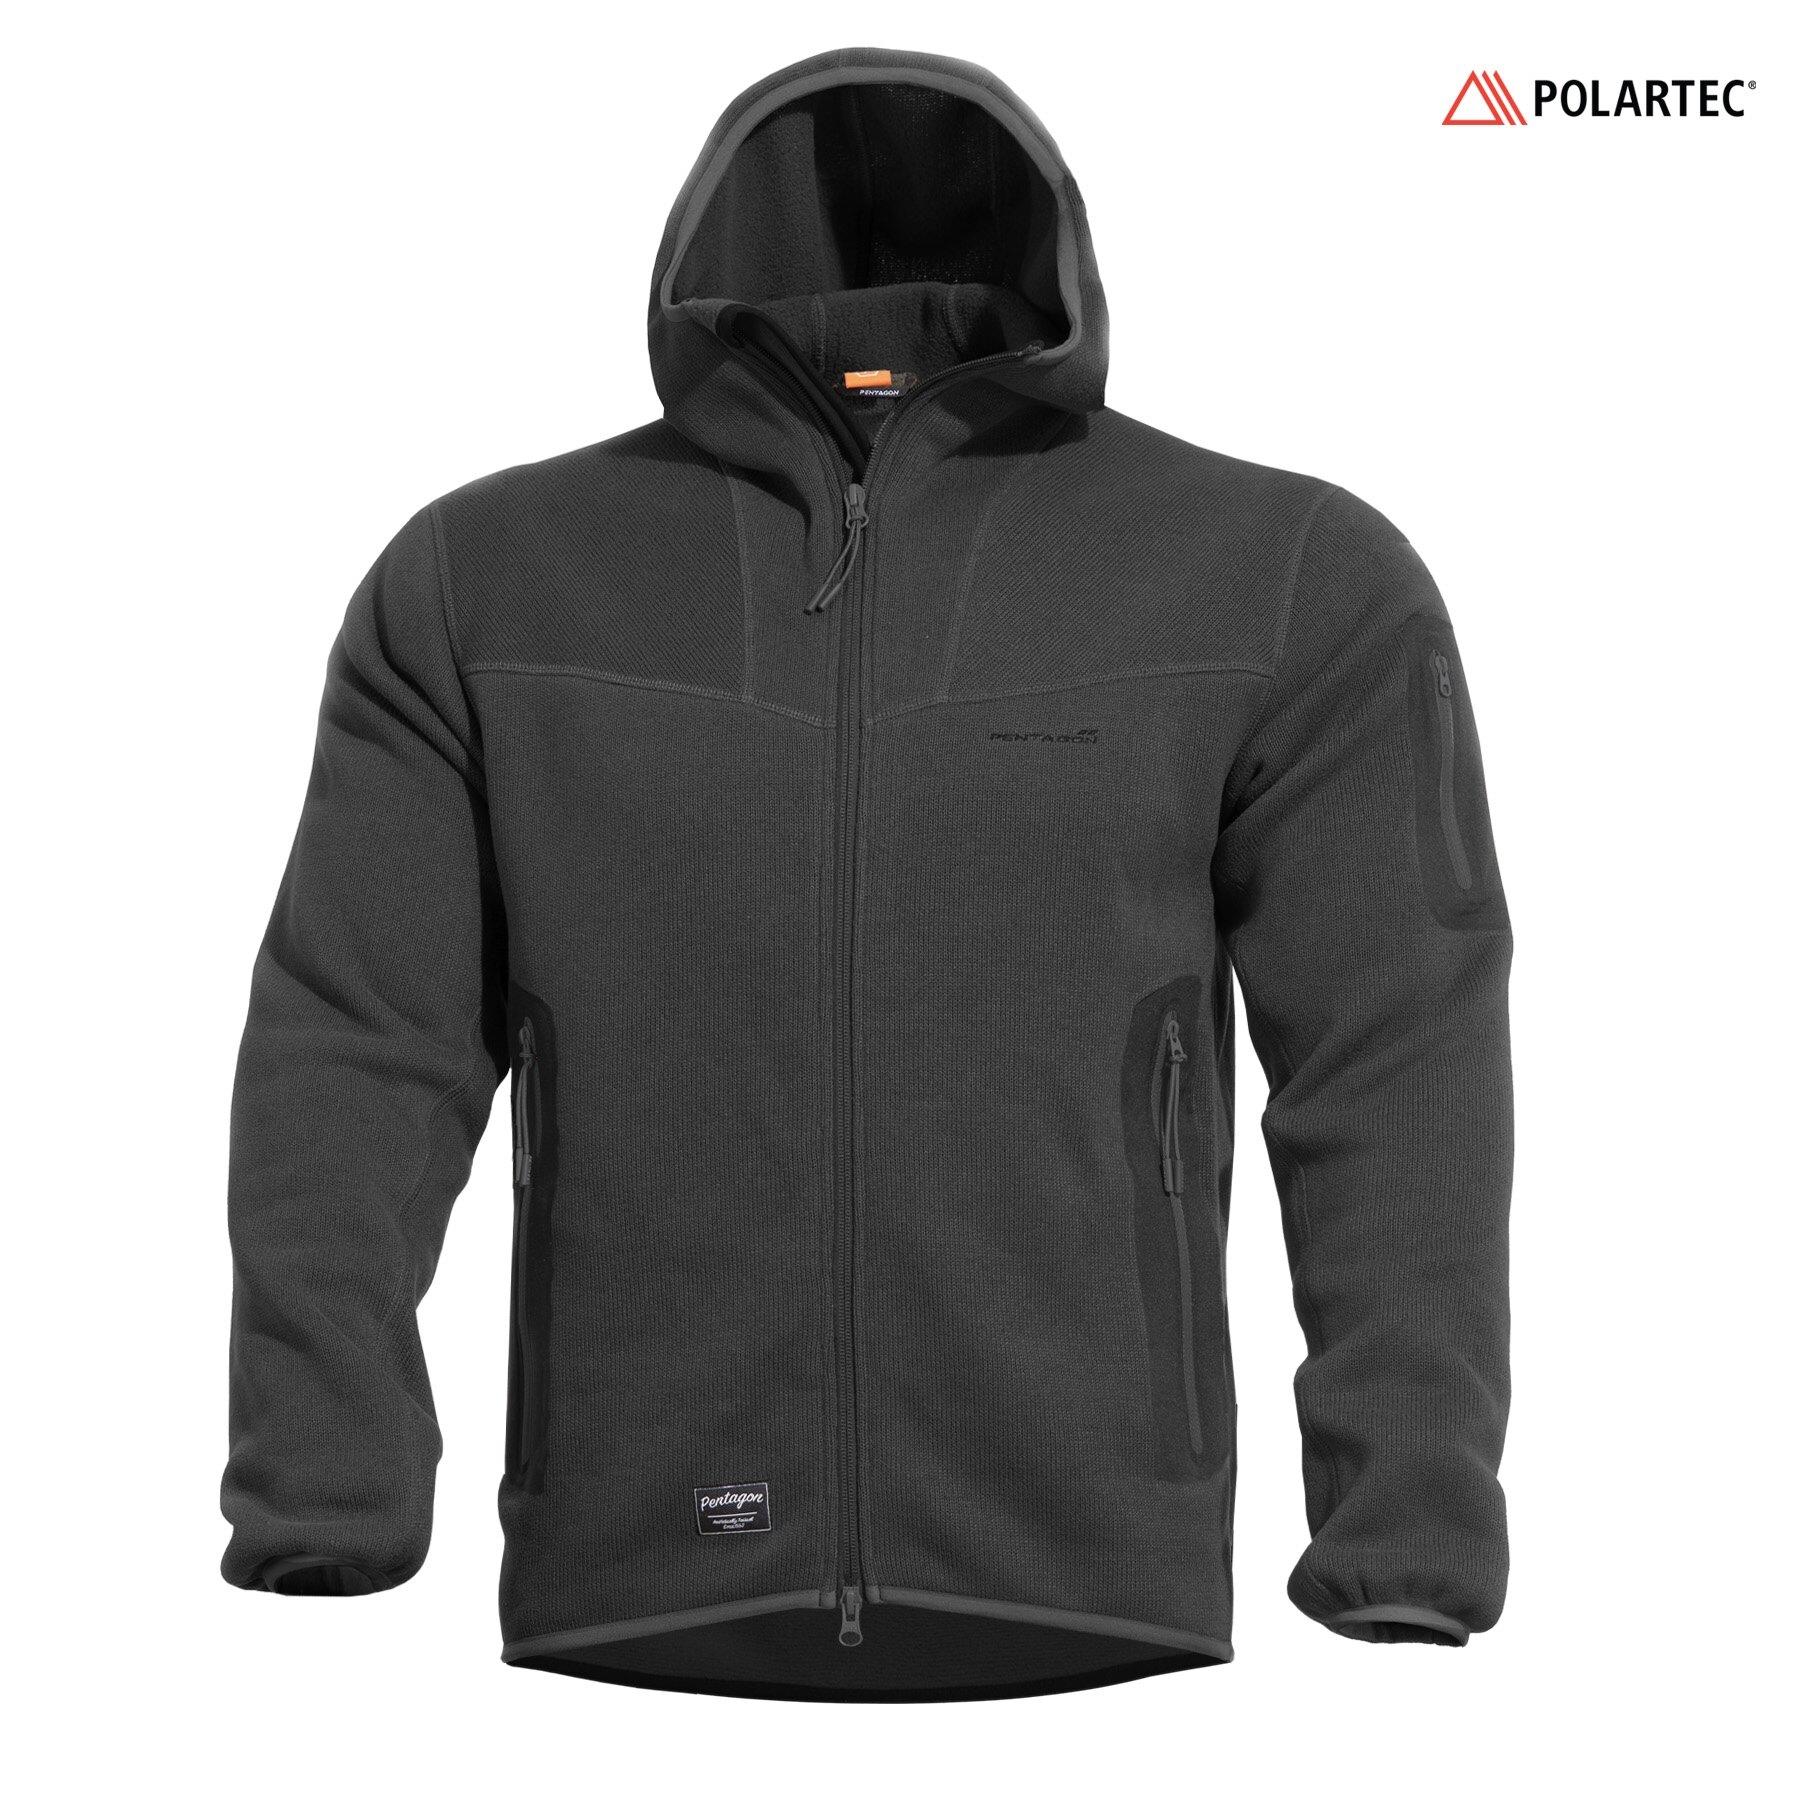 Mikina Falcon Pro Sweater Polartec® Pentagon® – Čierna (Farba: Čierna, Veľkosť: S)